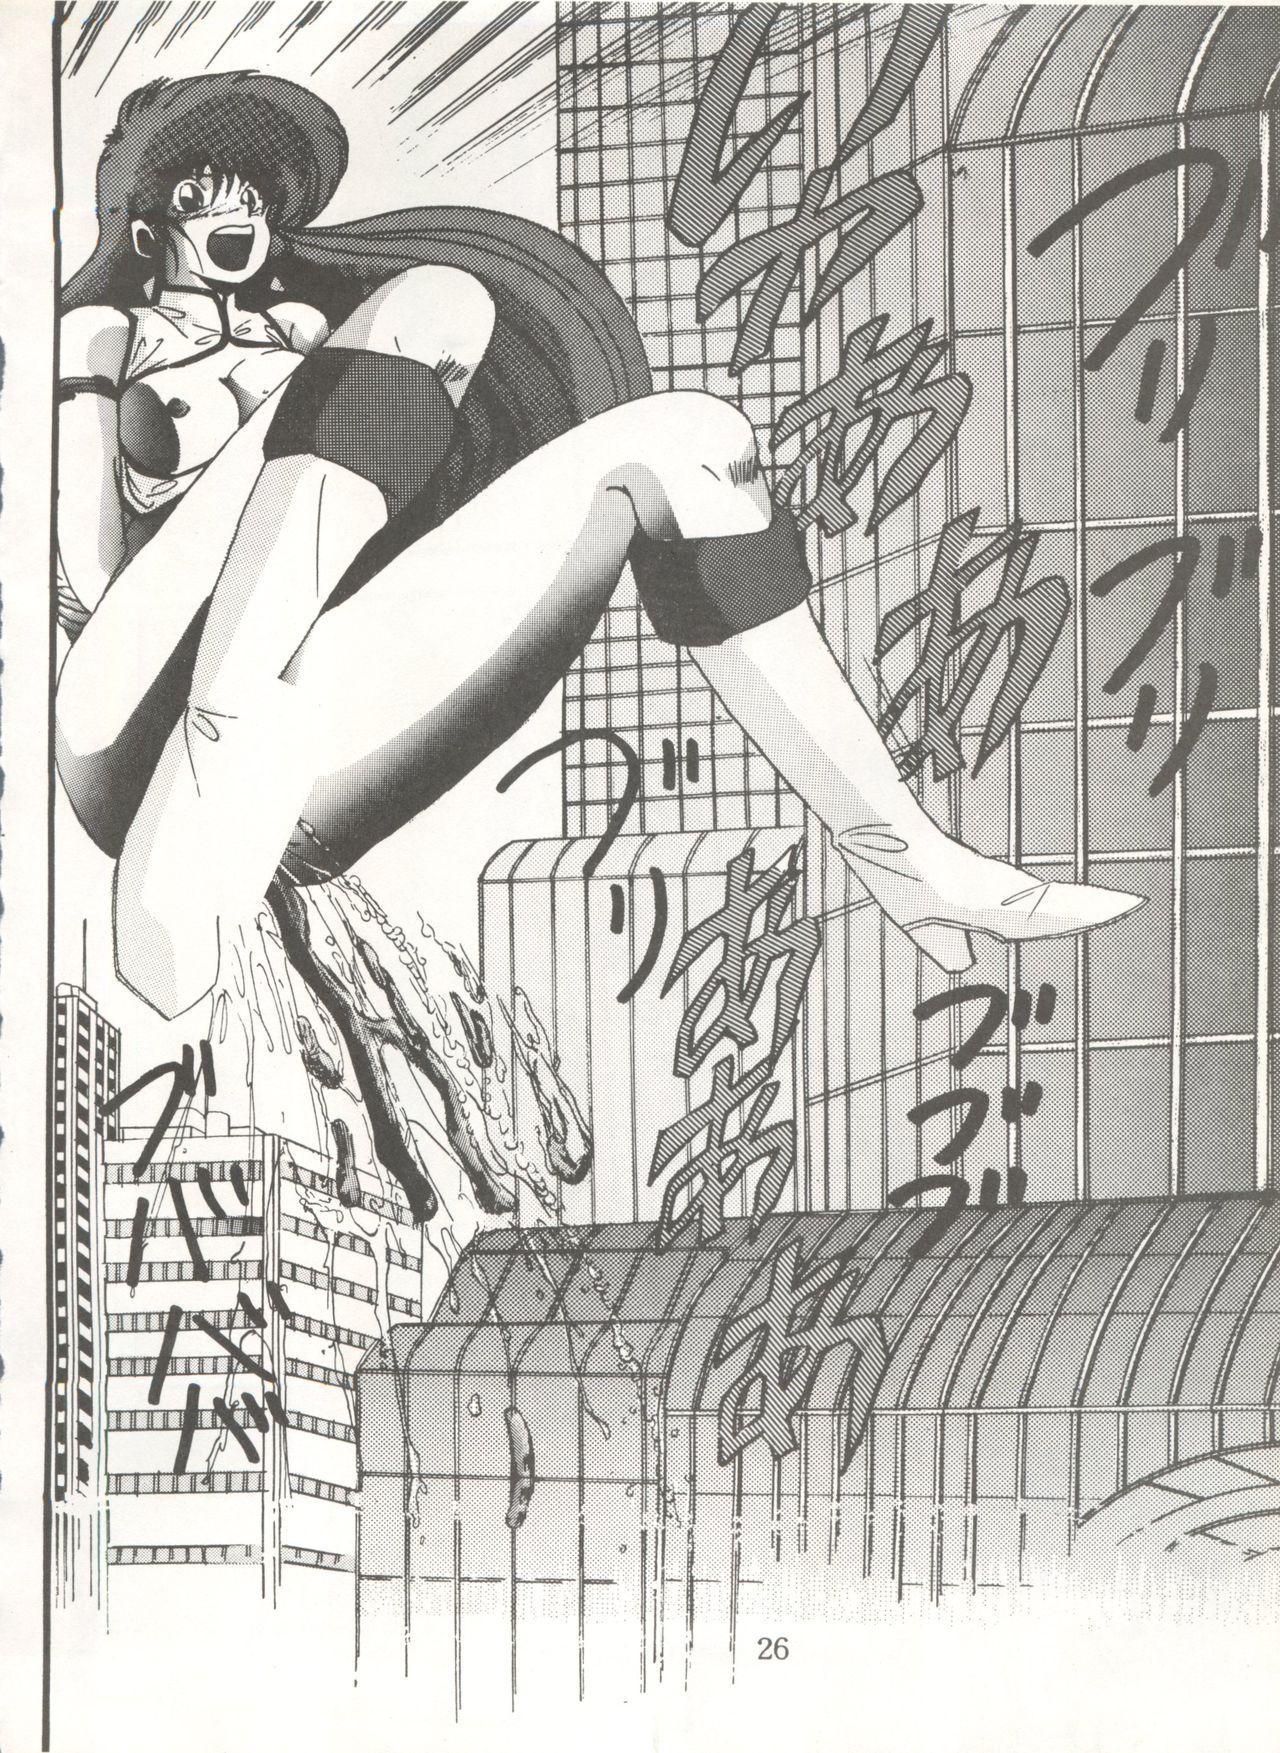 [Global One (MARO)] Sadistic 5 (Cutey Honey, Devilman, Sailor Moon), [Global One (MARO)] Sadistic (Dirty Pair, Fushigi no Umi no Nadia, Sailor Moon), [Studio Ikkatsumajin] .ribbon (Hime-chan's Ribbon) 85